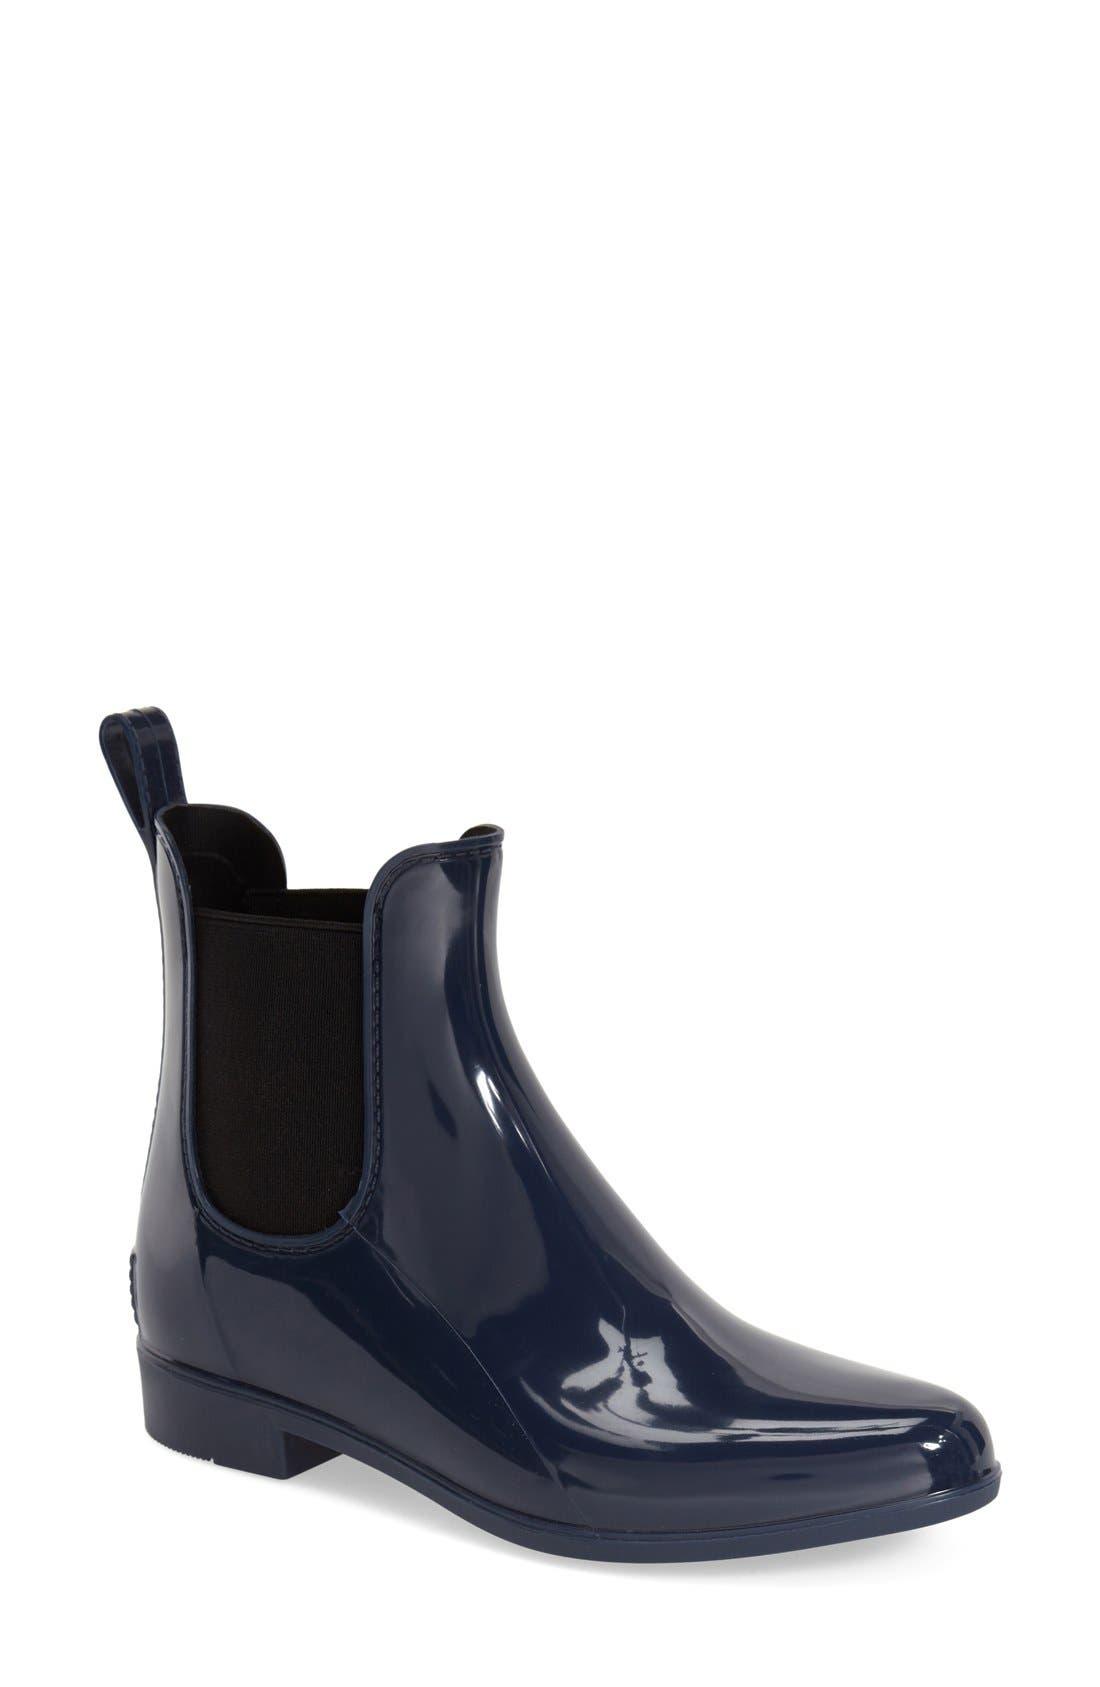 Alternate Image 1 Selected - Sam Edelman 'Tinsley' Rain Boot (Women)